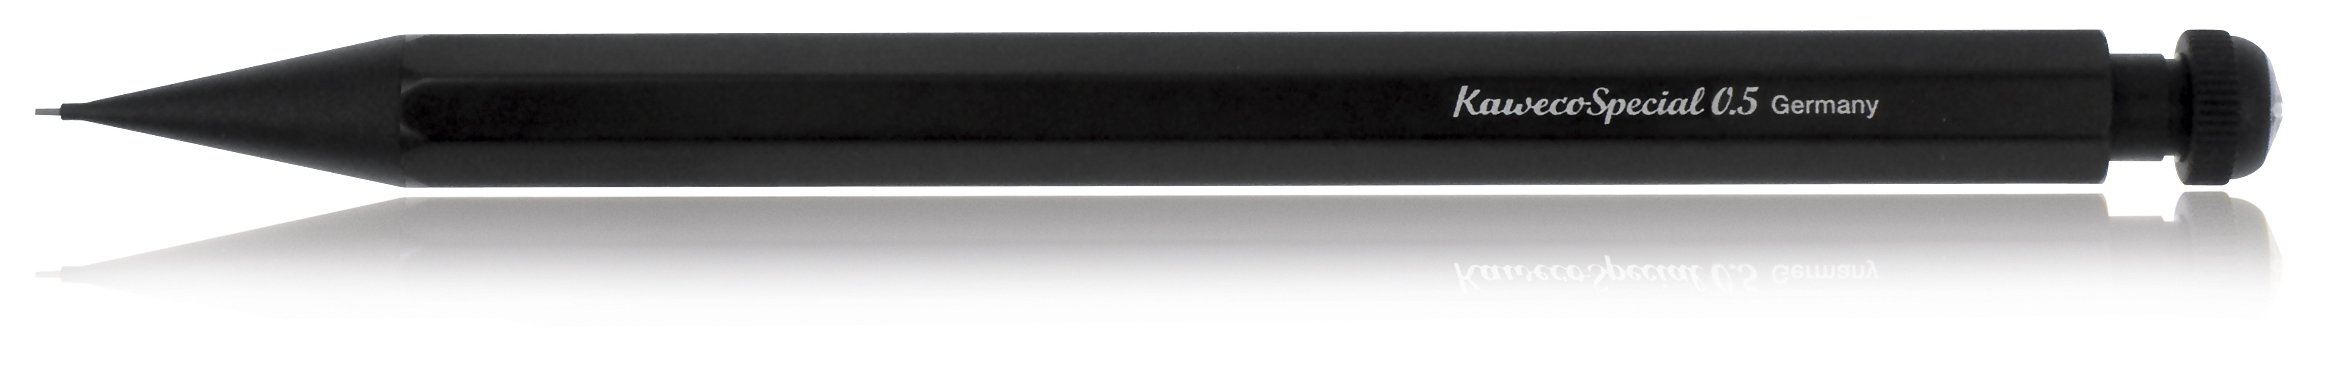 Kaweco Special AL Mechanical Pencil - 0.5 mm - Black Body by Kaweco Pens (Image #1)